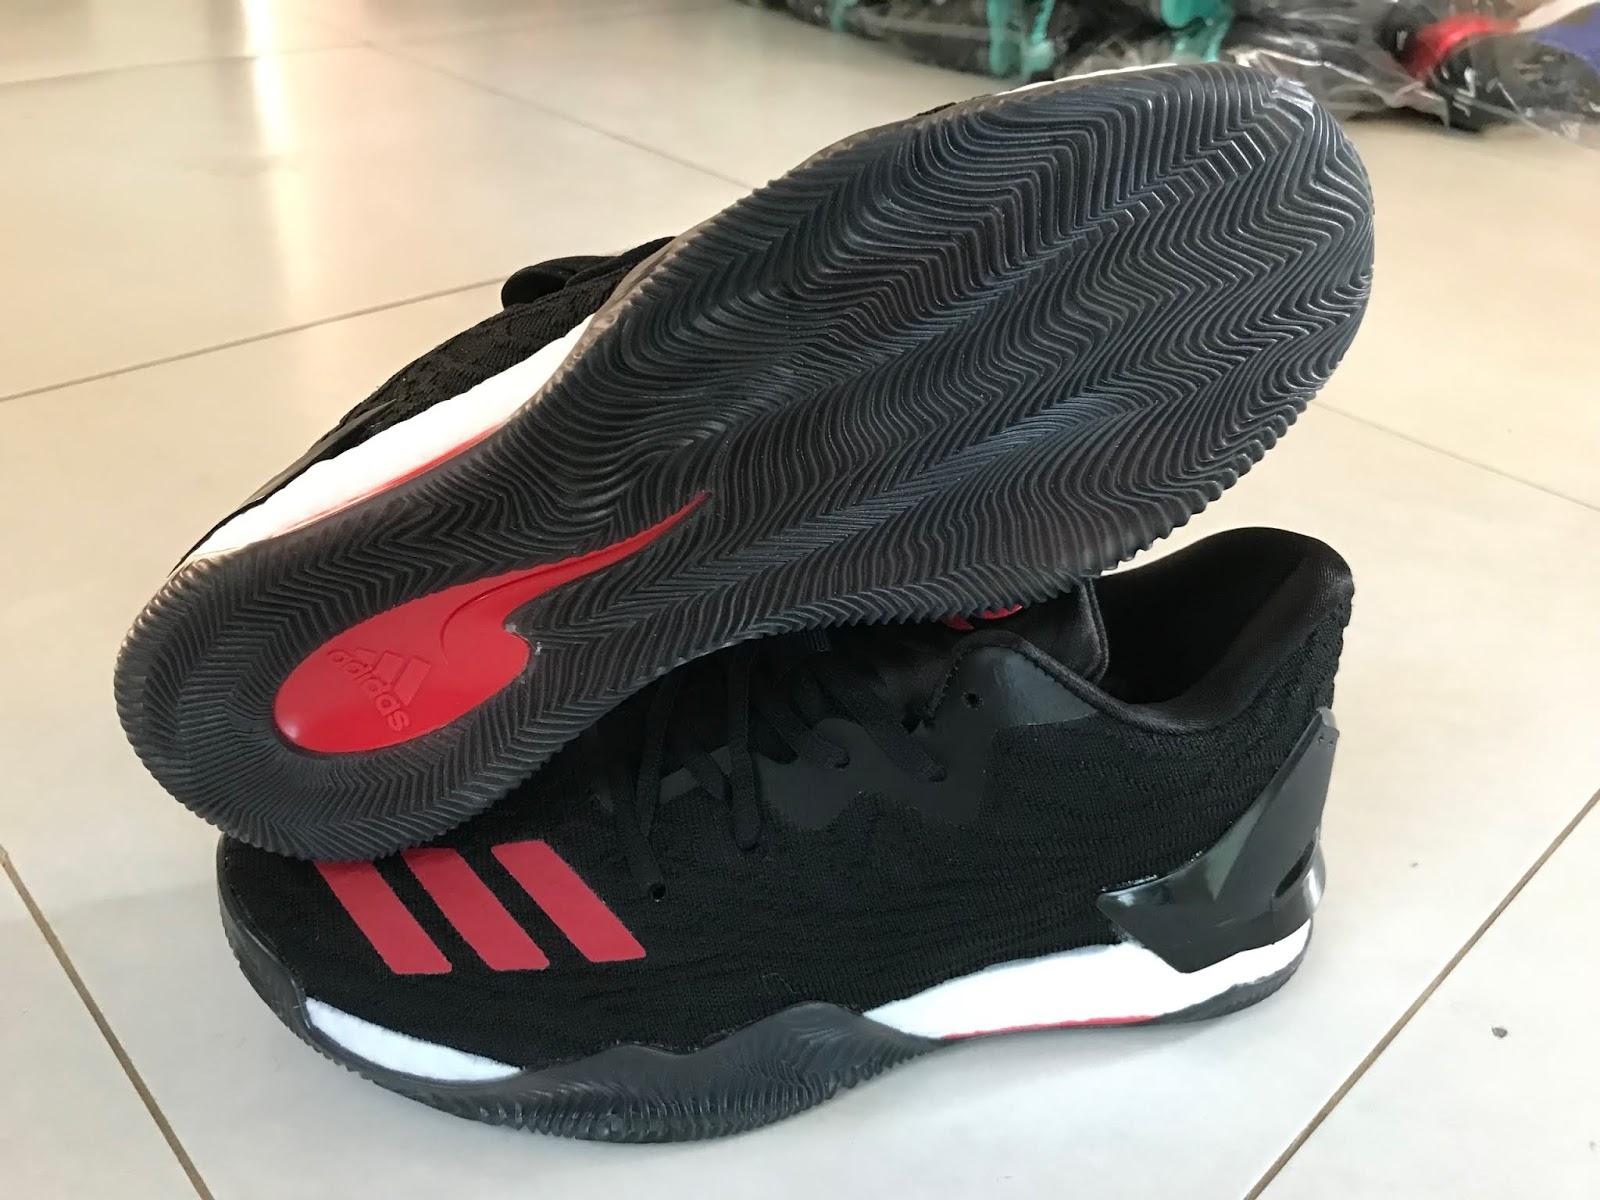 Giày Adidas Nam SF Size 41